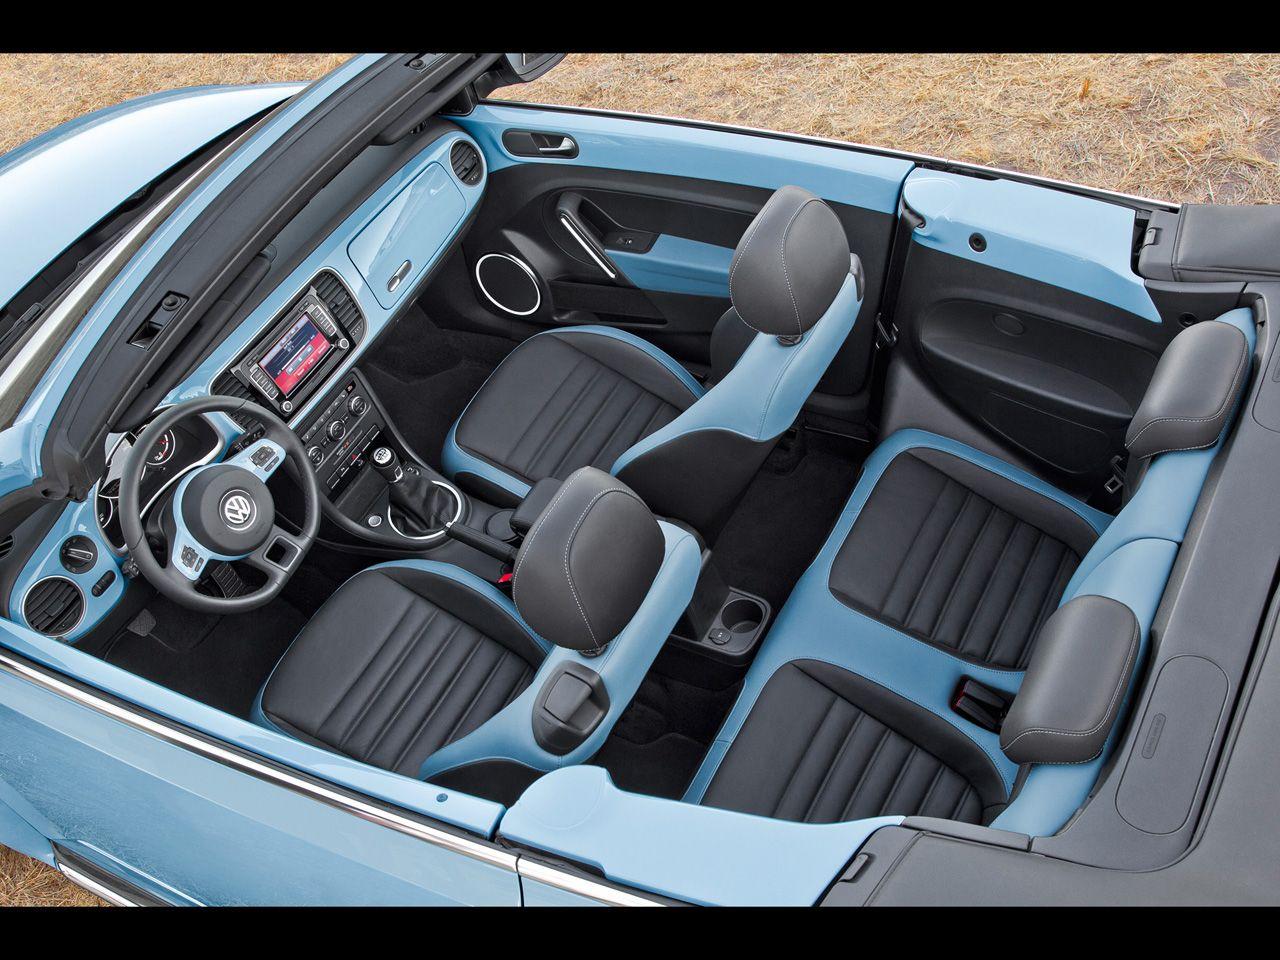 2013 Volkswagen Beetle Cabriolet Special Editions 60s Edition Interior 2 1280x9 Volkswagen Beetle Volkswagen Beetle Accessories Volkswagen Beetle Cabriolet